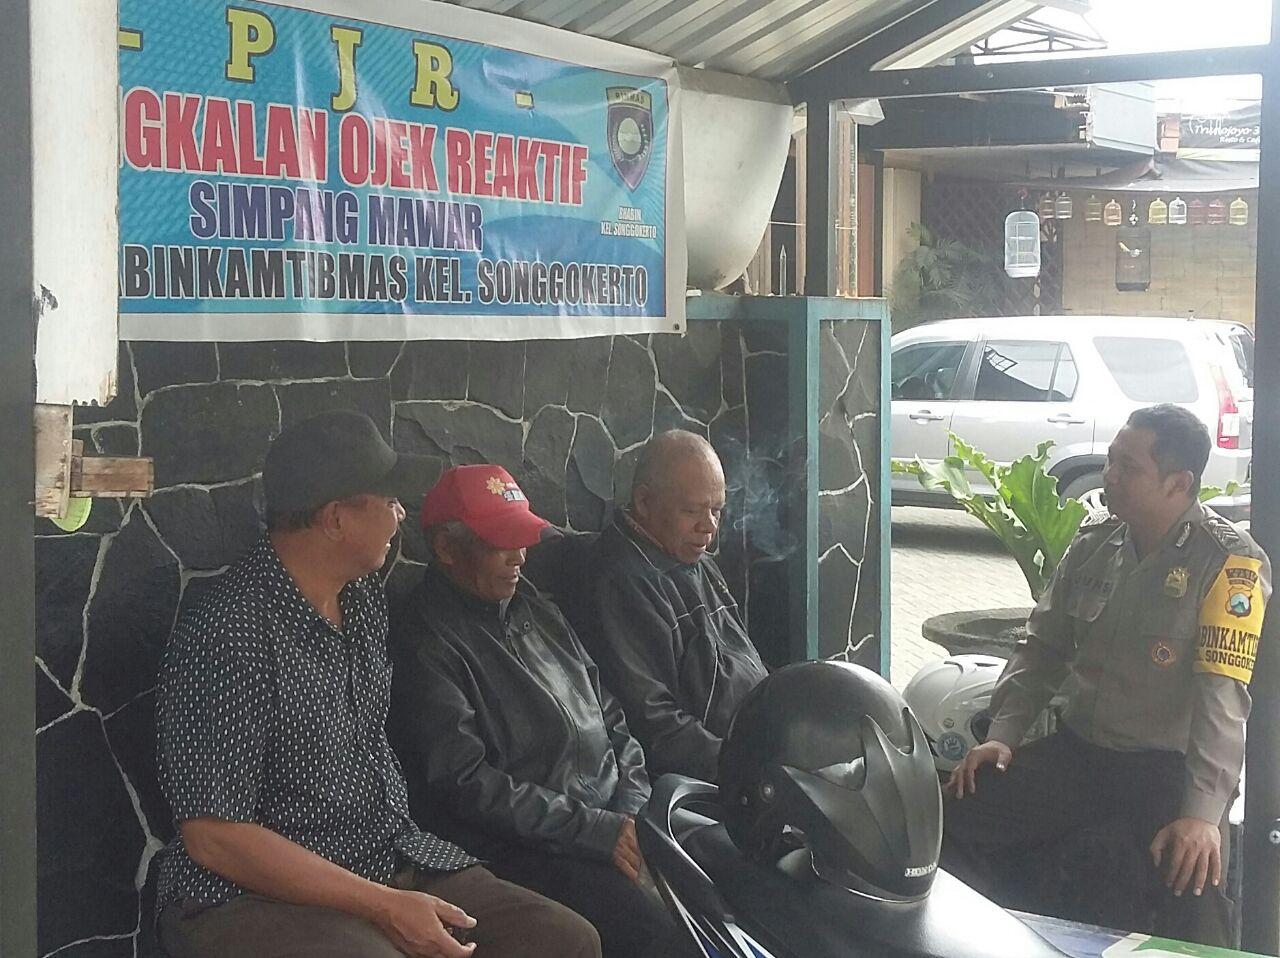 Anggota Bhabinkamtibmas Polsek Batu Kota Polres Batu Melaksanakan Giat Sambang Pangkalan Ojek Reaktif